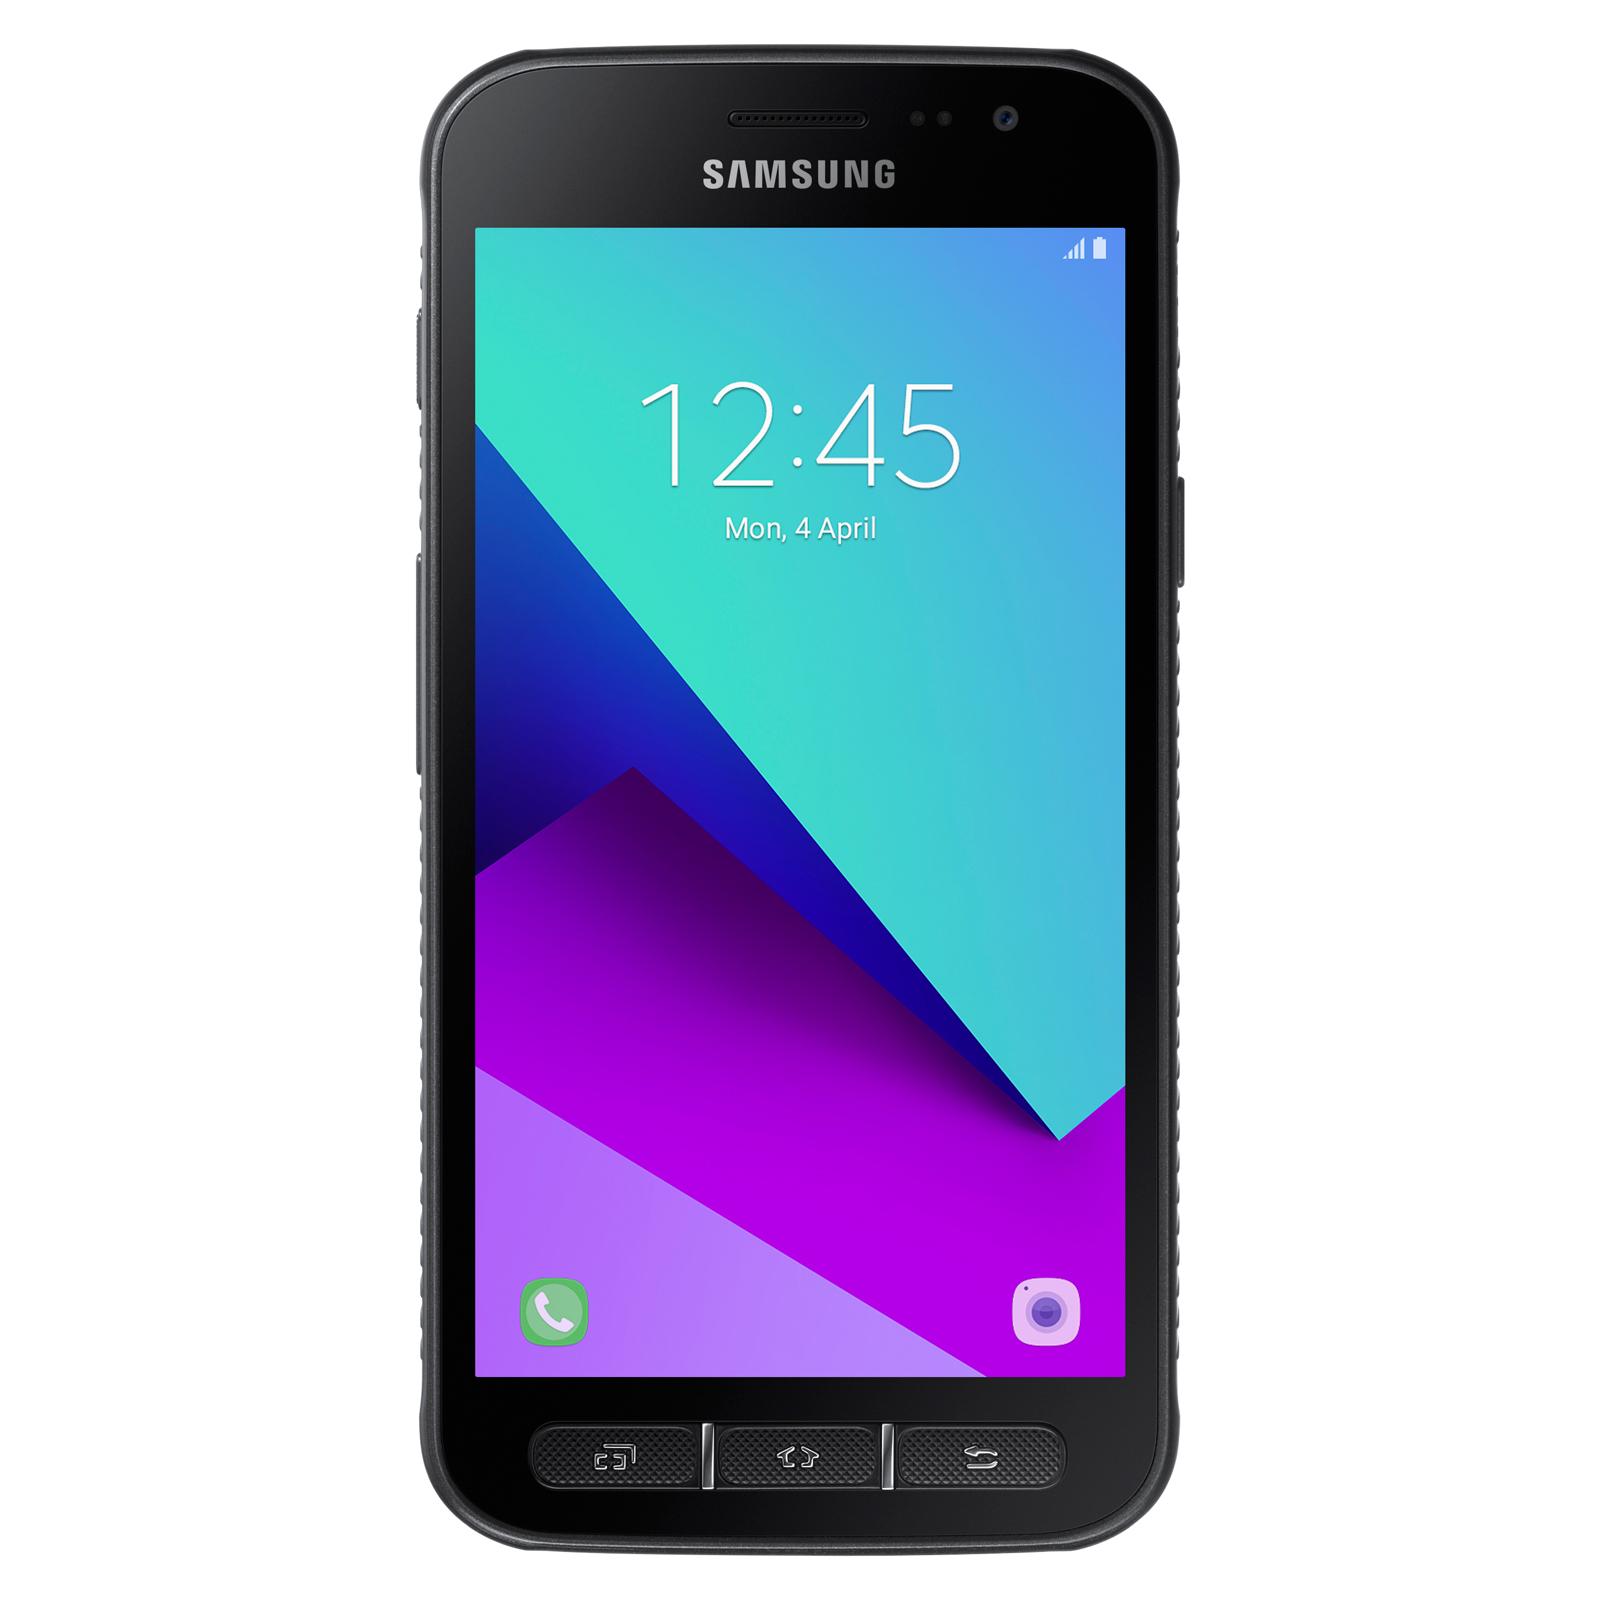 "Mobile & smartphone Samsung Galaxy Xcover 4 SM-G390F Noir Smartphone 4G-LTE IP68 - Exynos 7570 Quad-Core 1.4 Ghz - RAM 2 Go - Ecran tactile 5"" 720 x 1280 - 16 Go - NFC/Bluetooth 4.2 - 2800 mAh - Android 7.0"